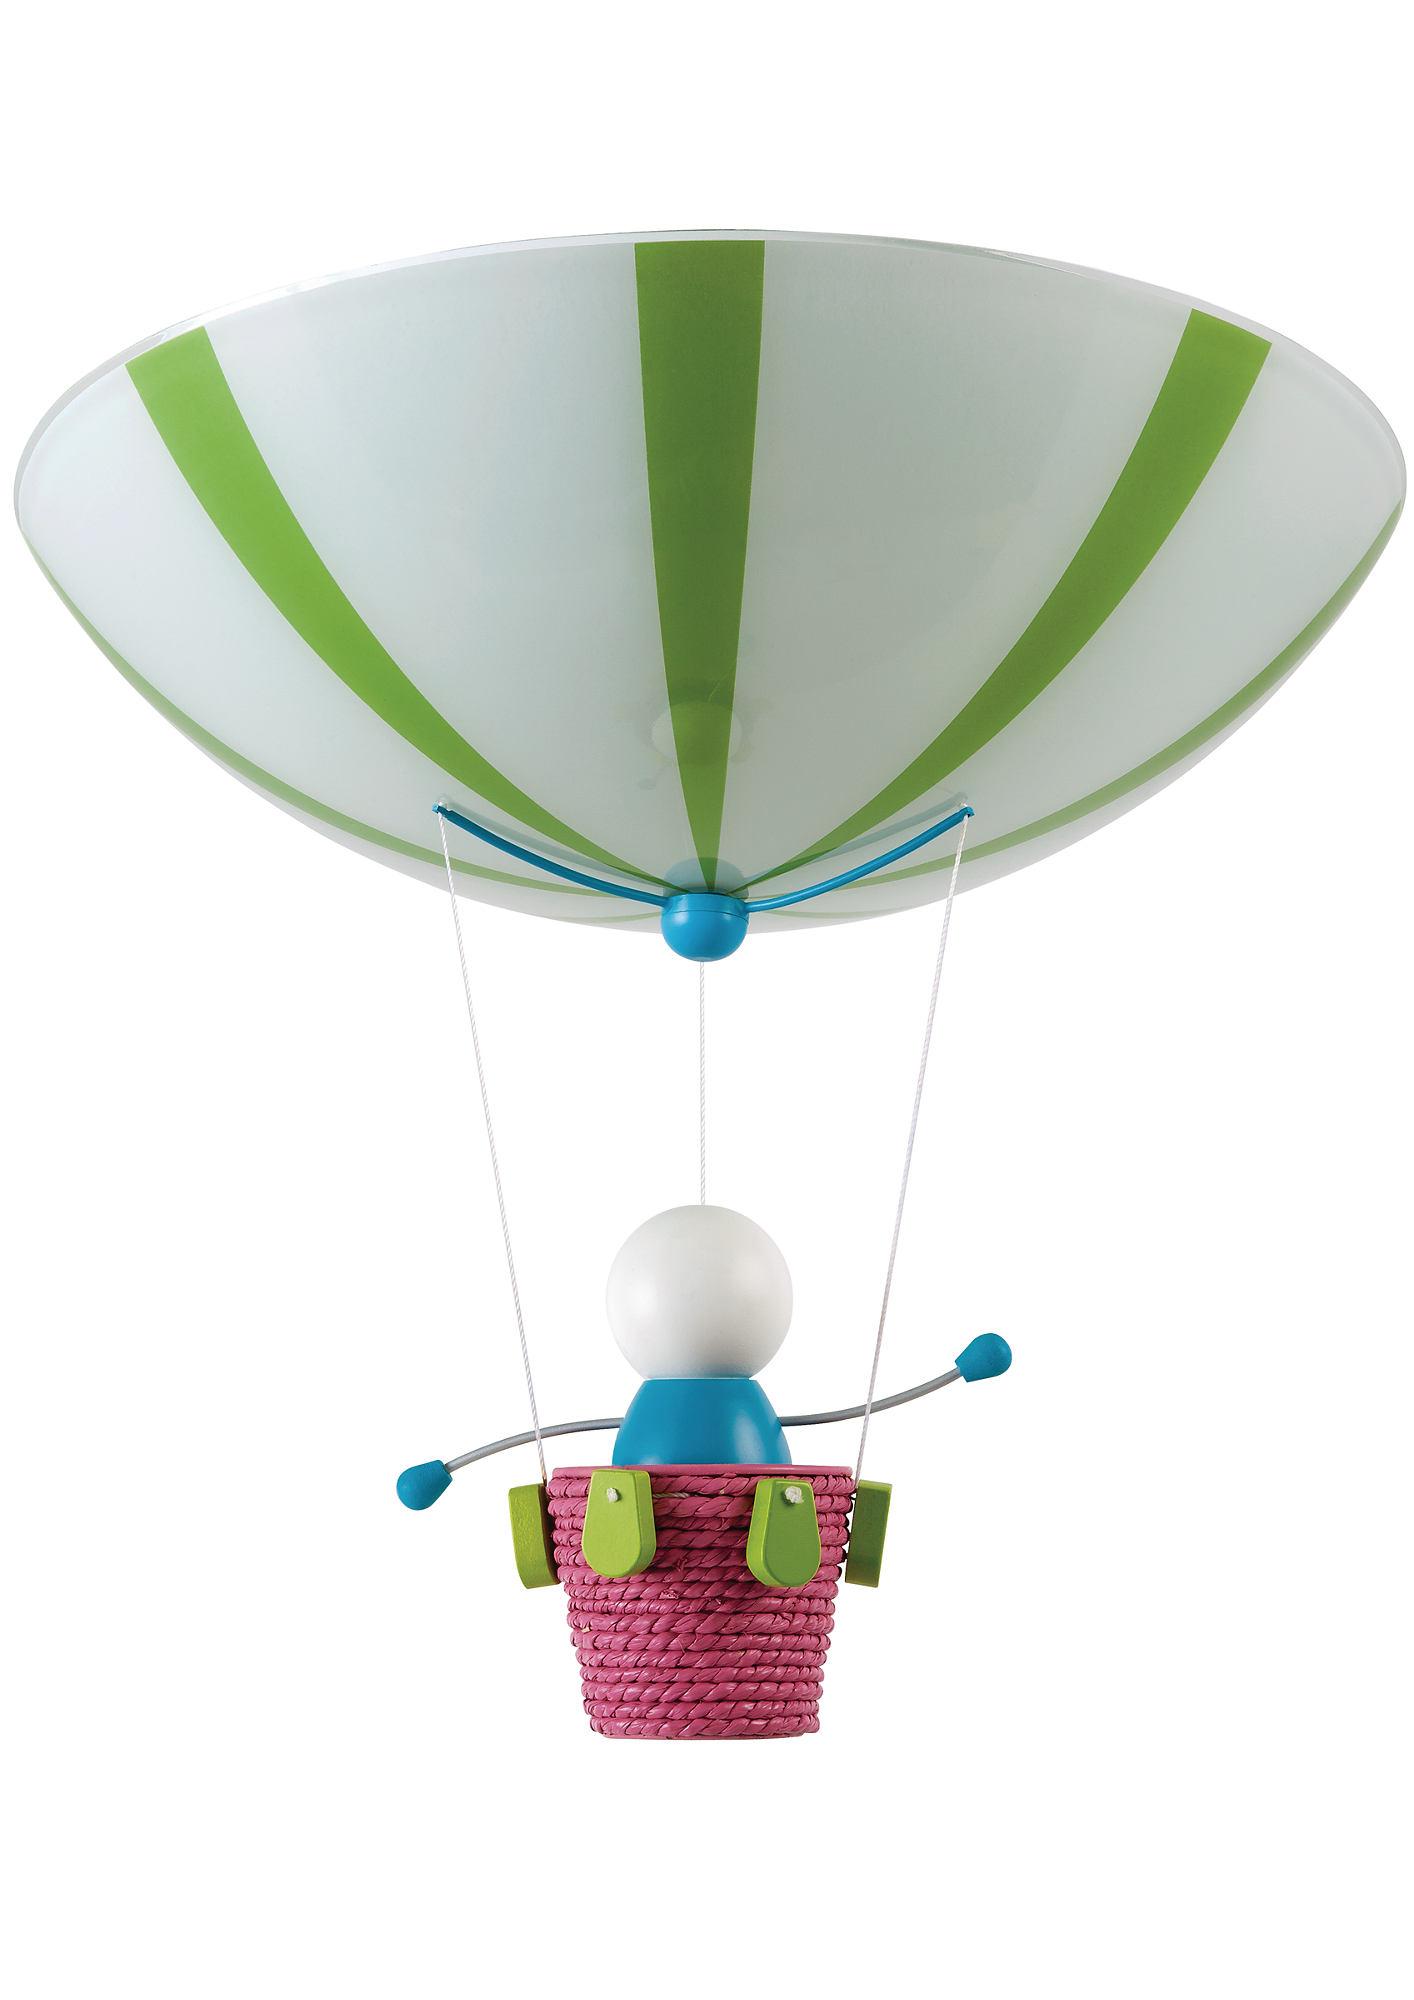 -Kidsplace-30808-Big Ballon Ceiling Light